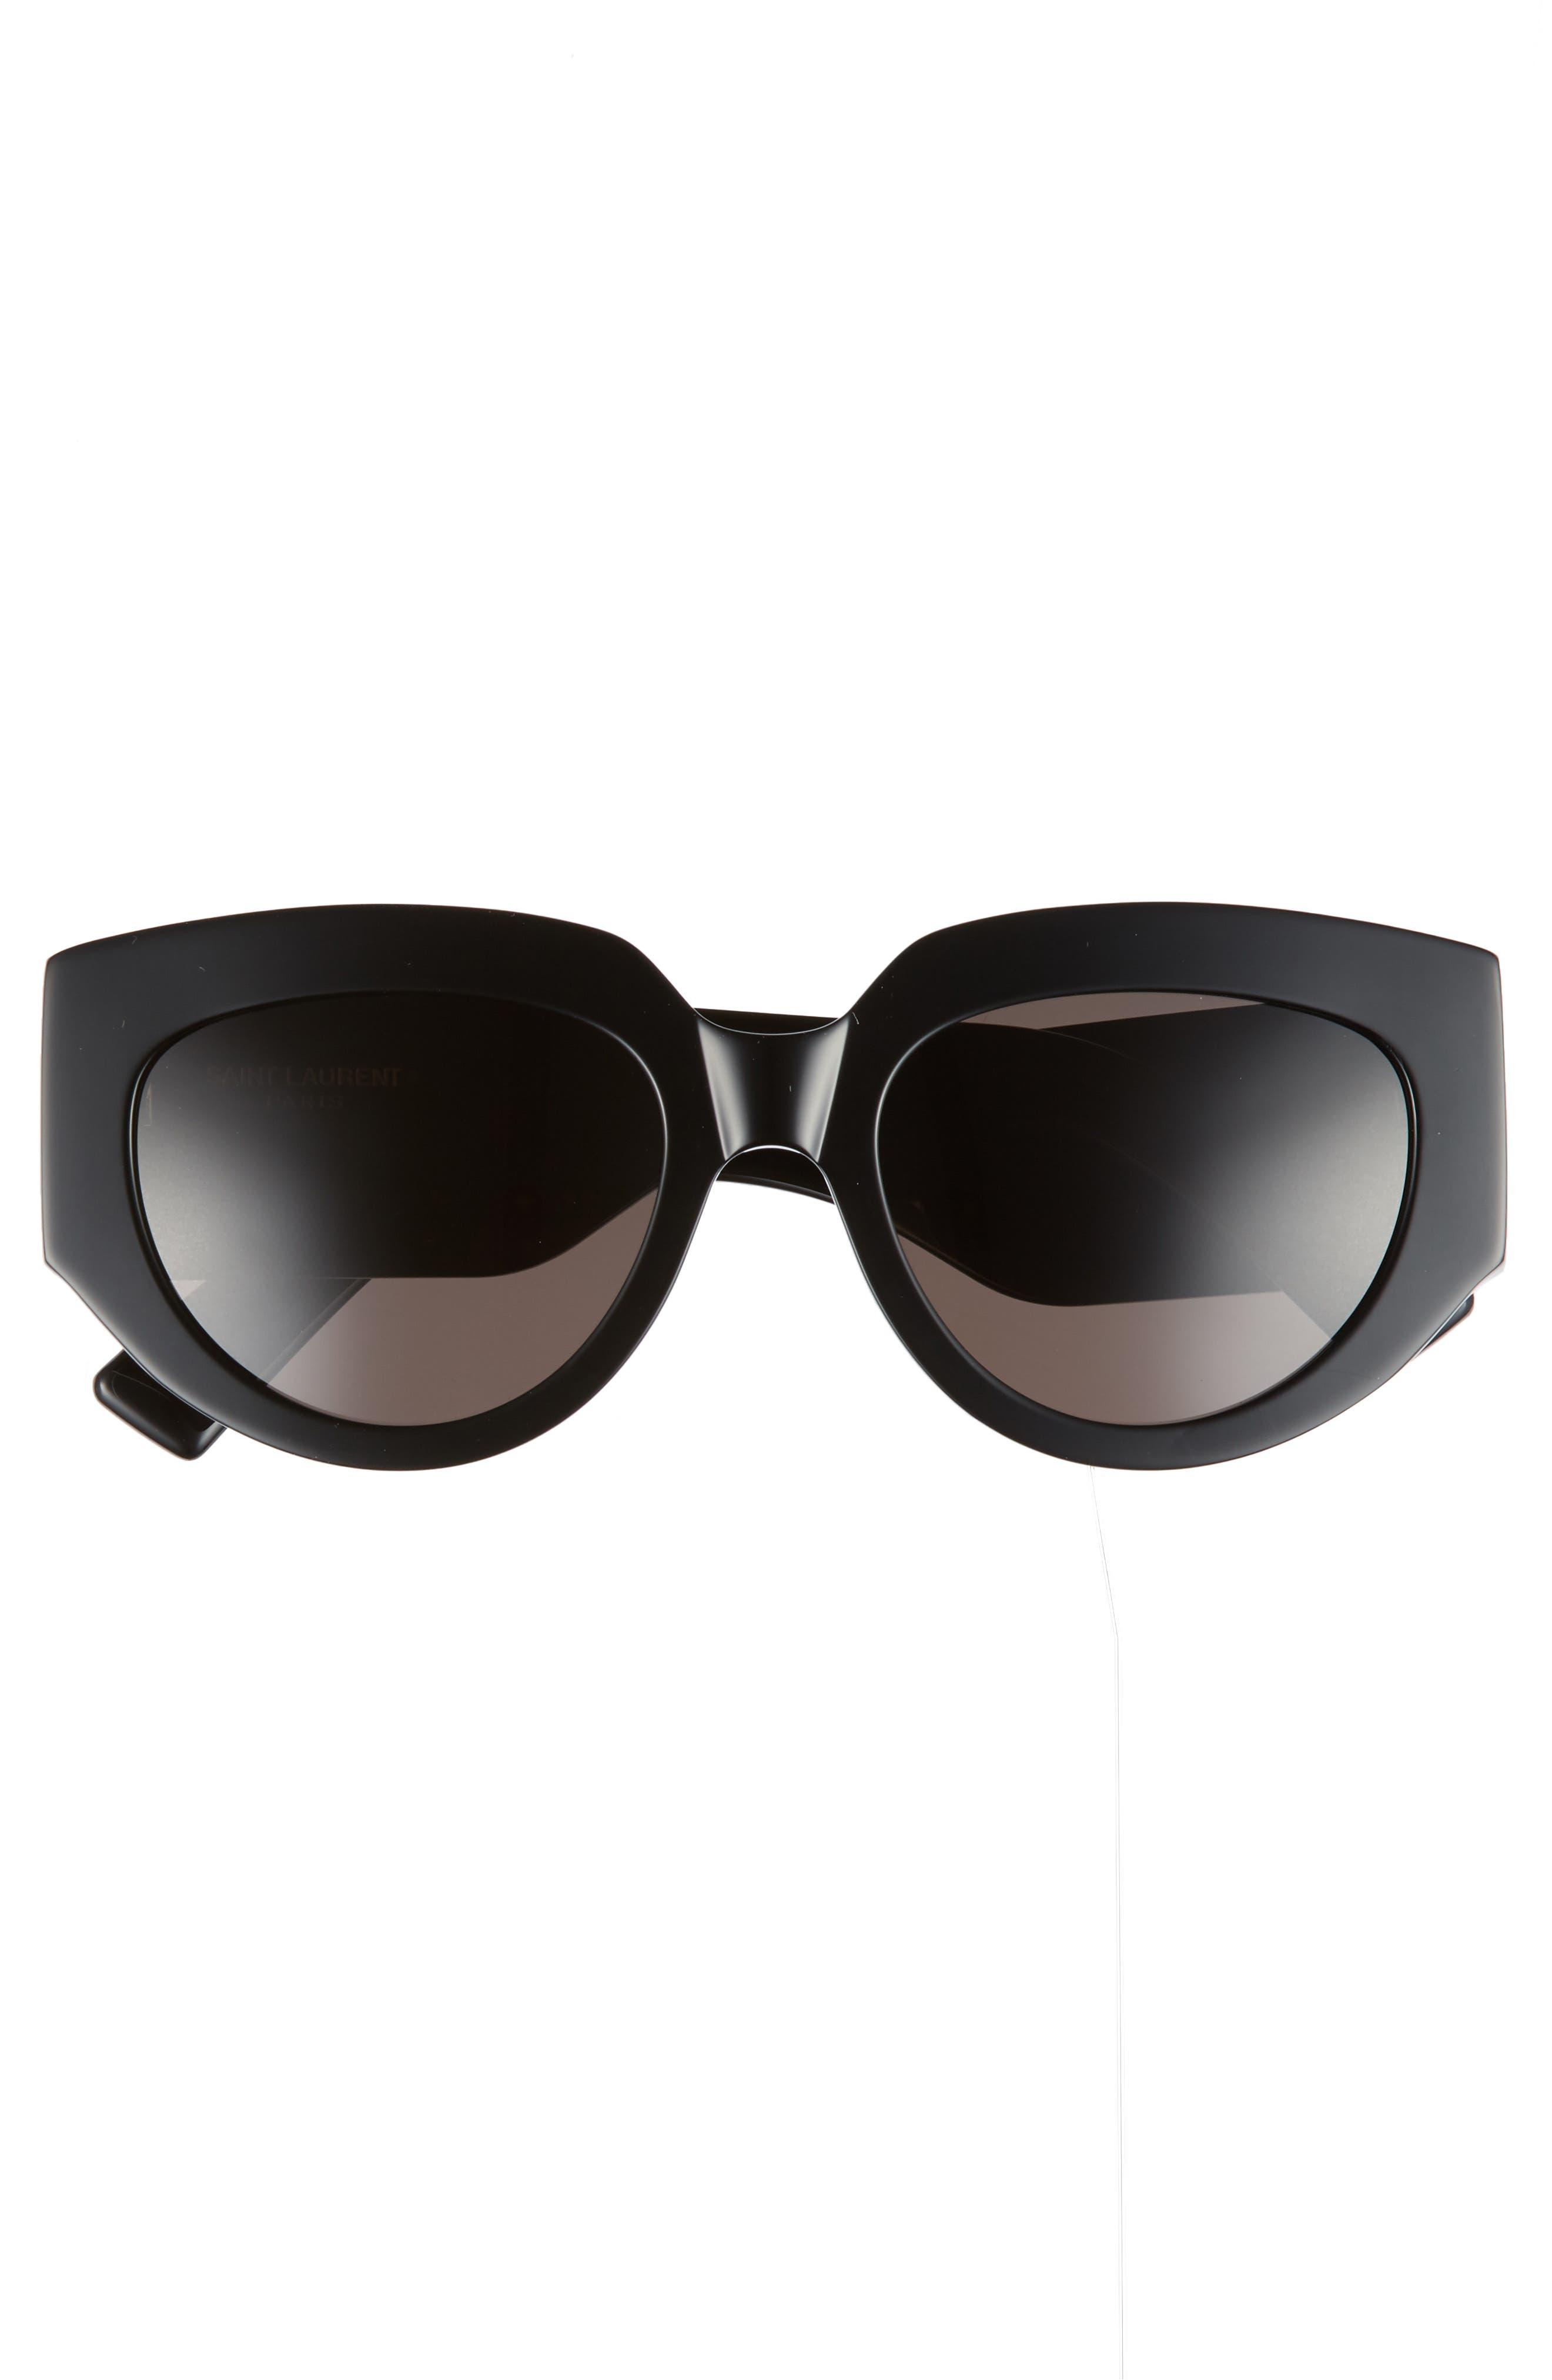 Rope 54mm Cat Eye Sunglasses,                             Alternate thumbnail 3, color,                             Black/ Black